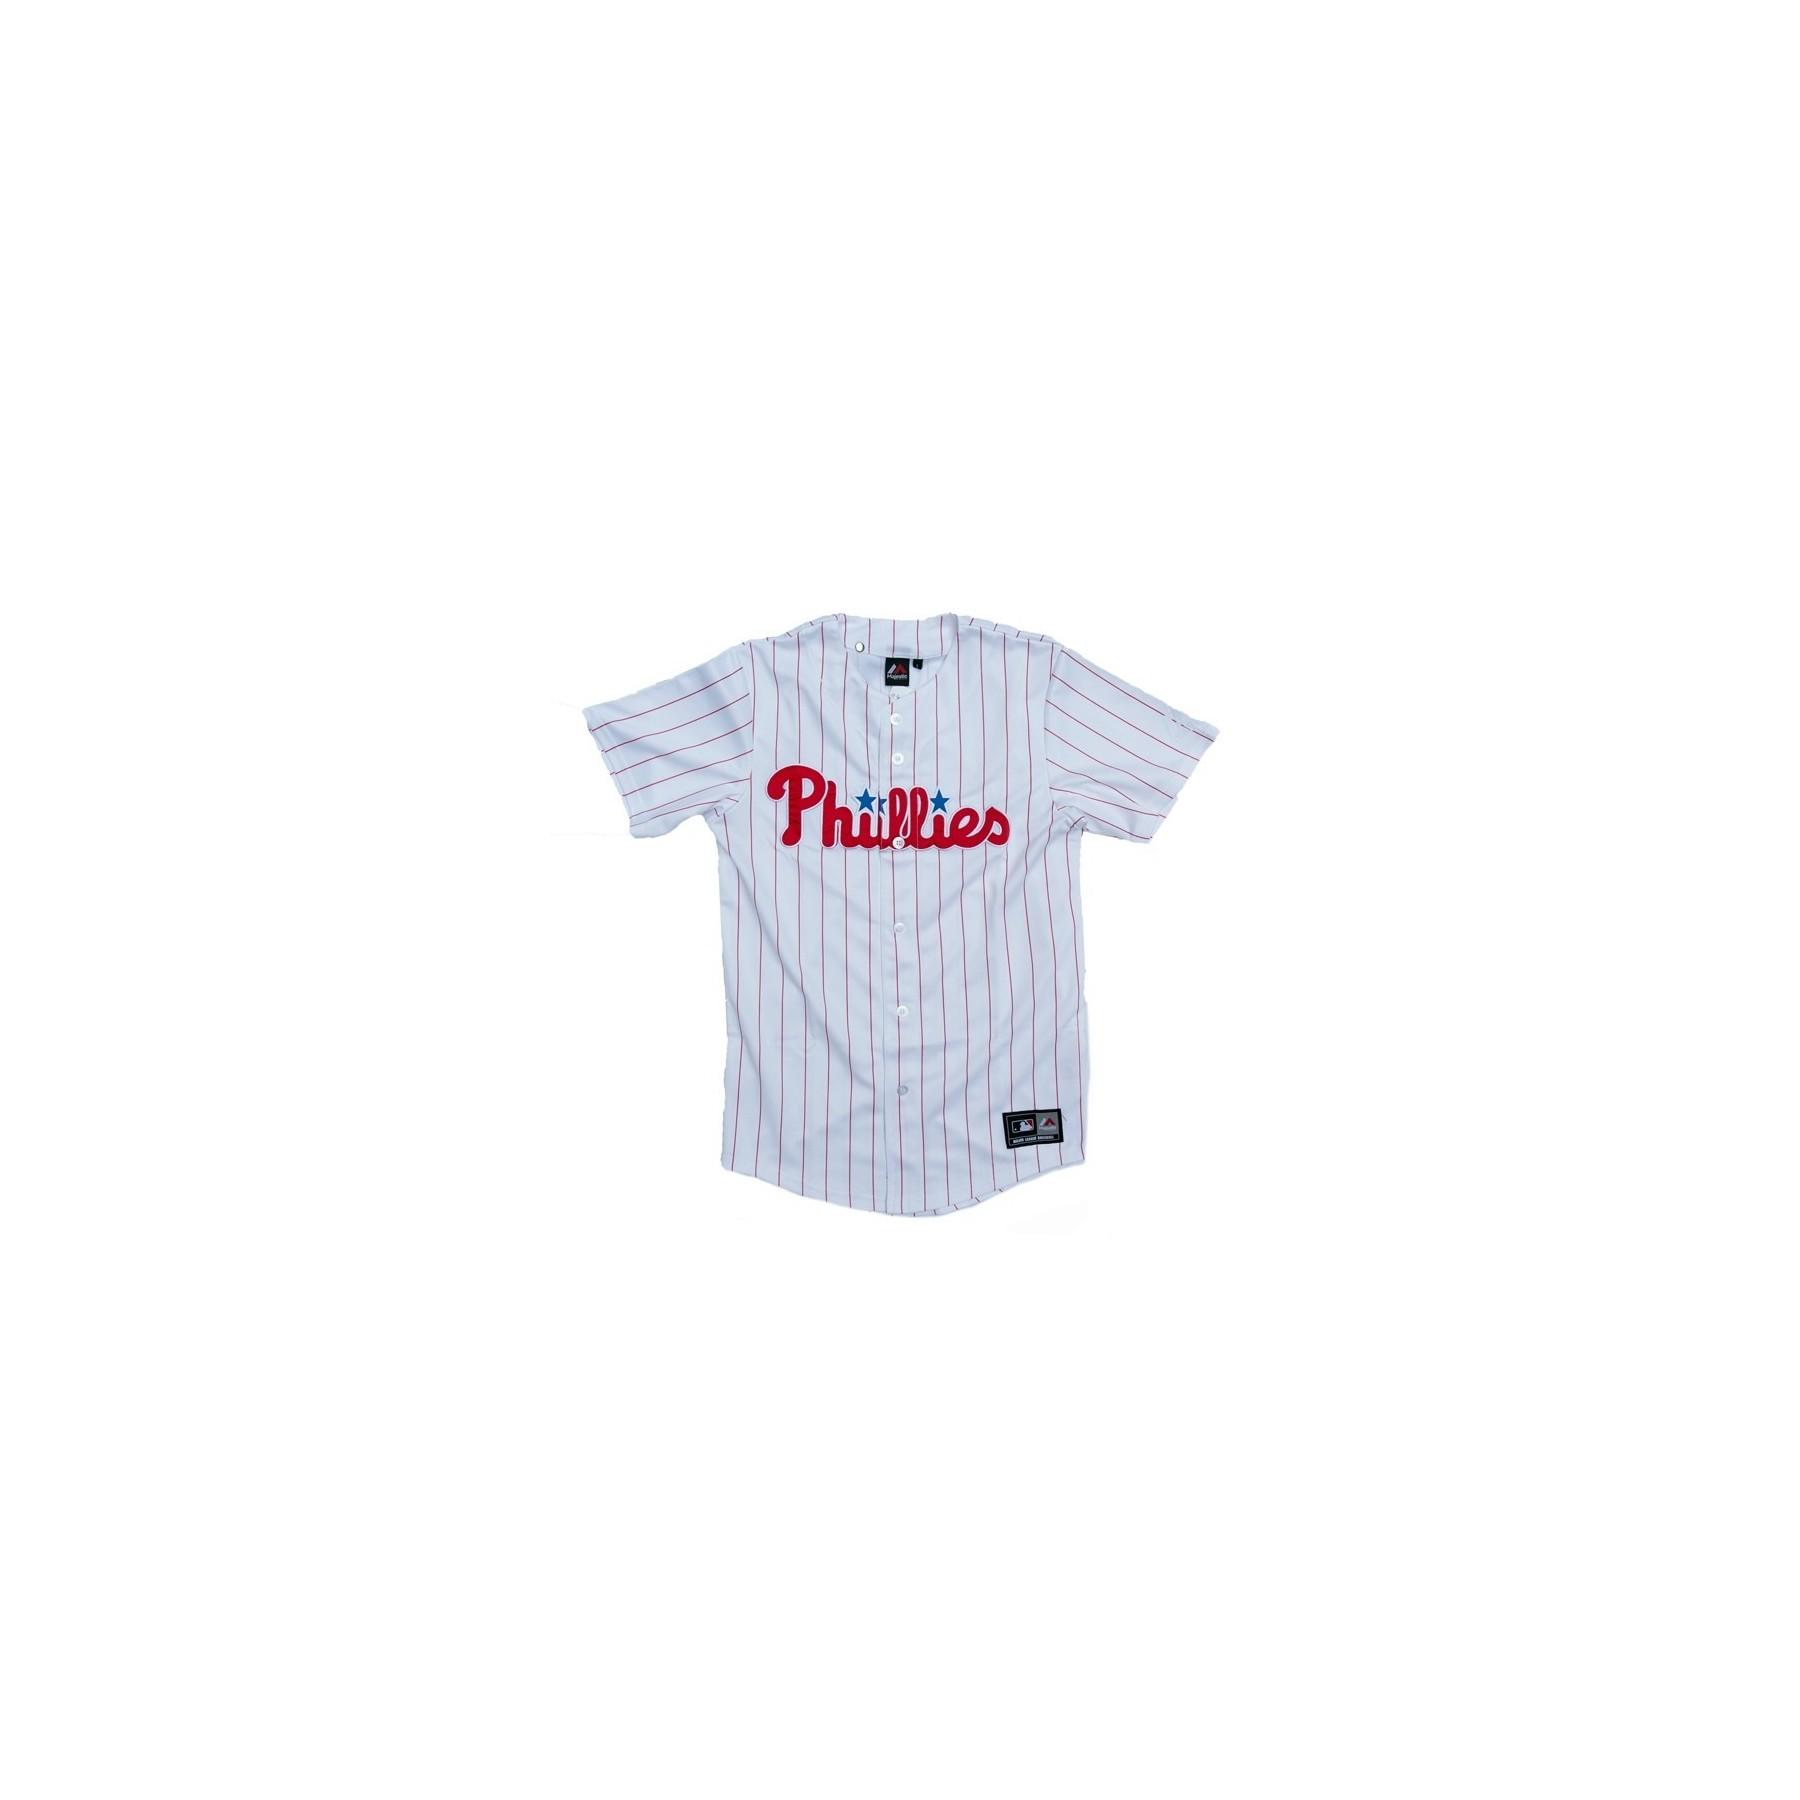 wholesale dealer 69dab 3e6fb CASACCA MAJESTIC BASEBALL JERSEY REPLICA MLB PHILADELPHIA PHILLIES HOME  White/Red unico   Atipicishop.com